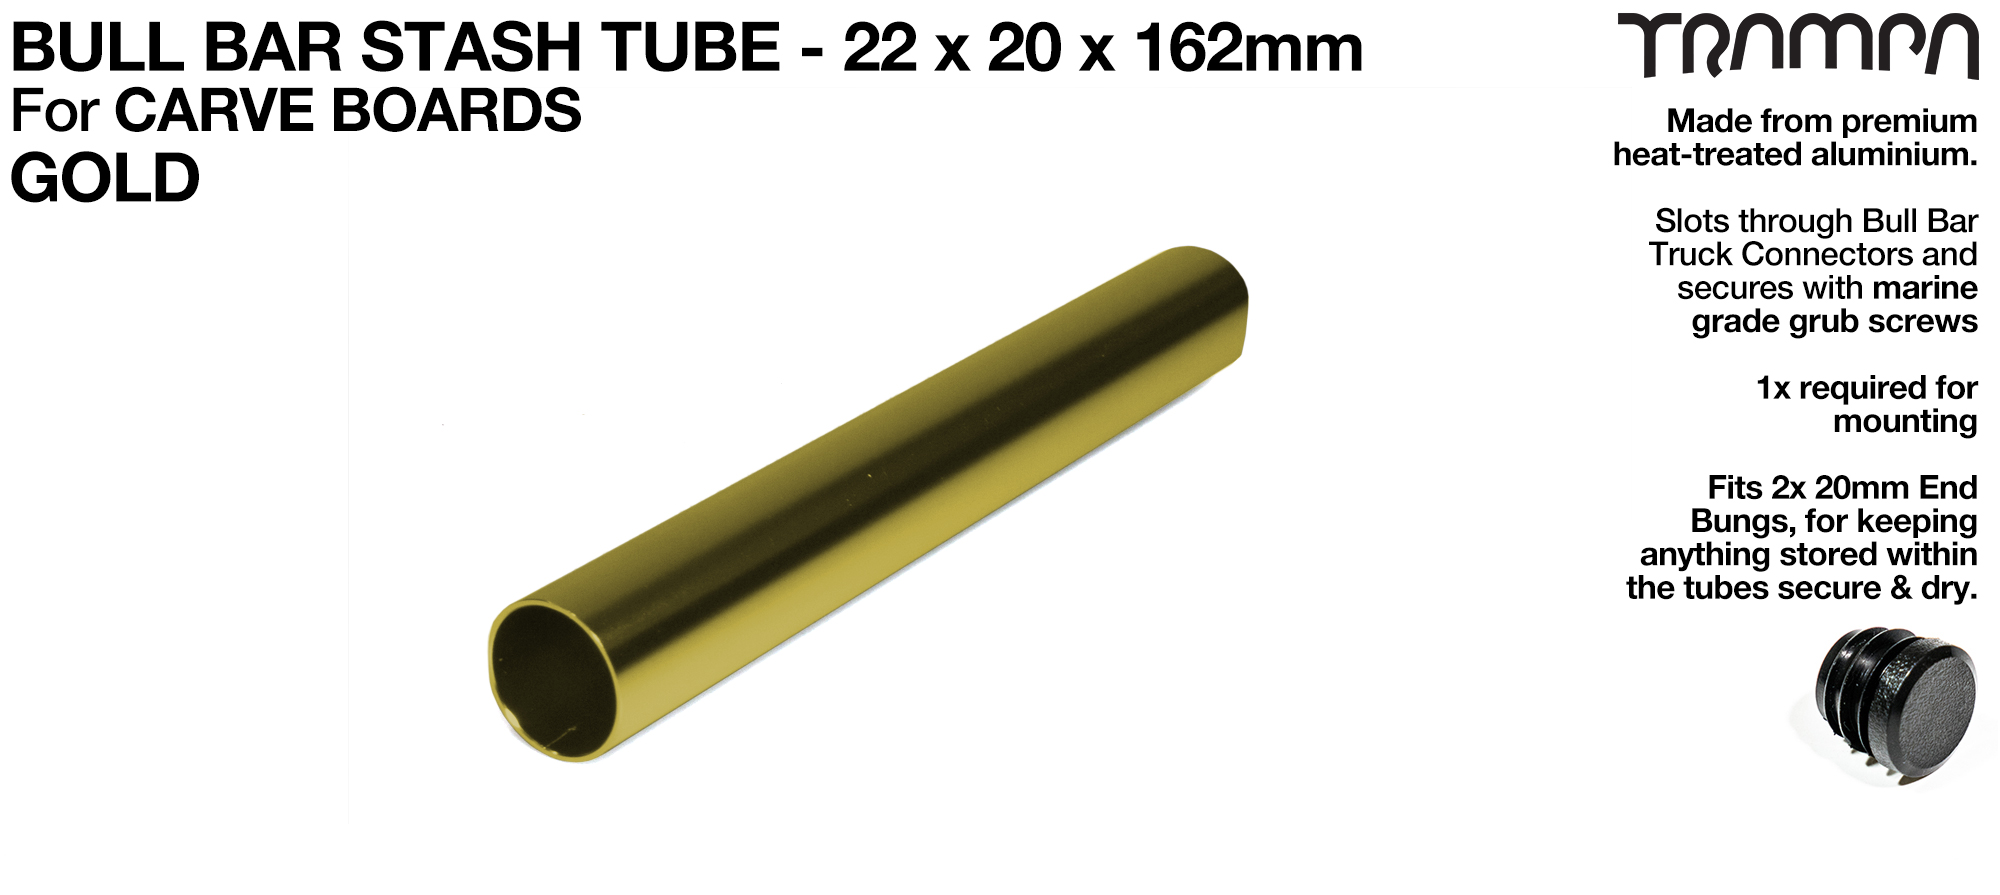 Carve Board Bull Bar Hollow Aluminium Stash Tube - GOLD 22 x 20 x 162 mm